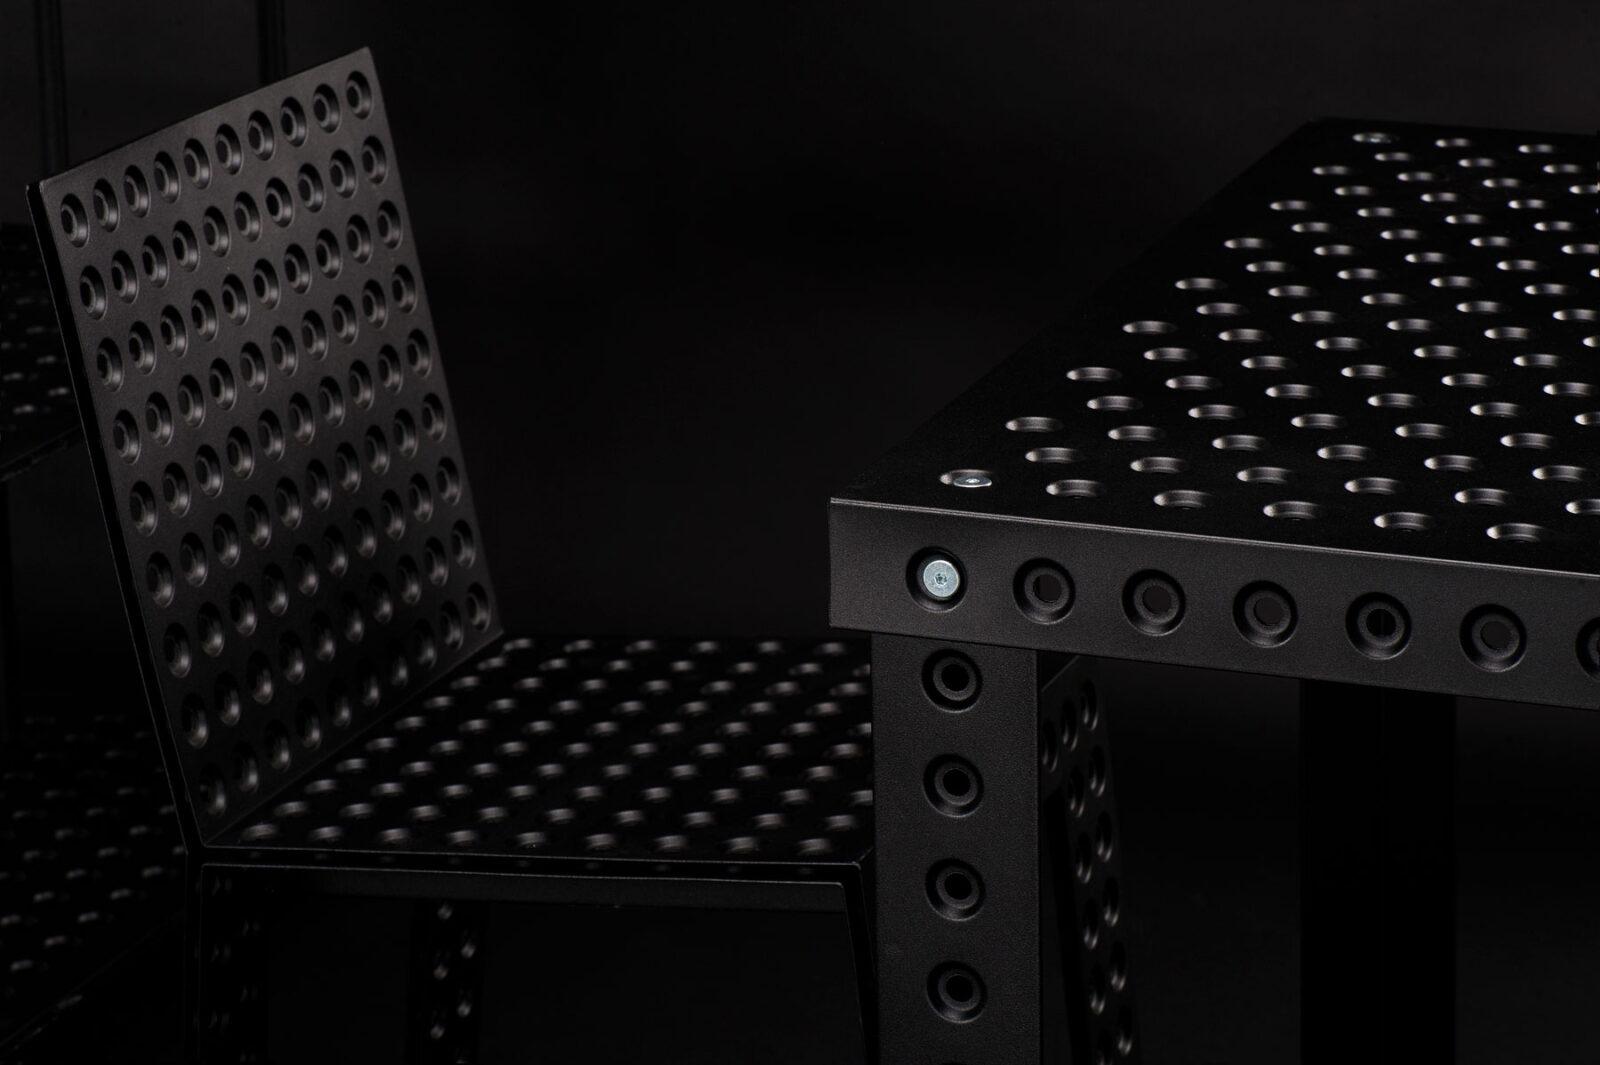 zieta_3plus_table1